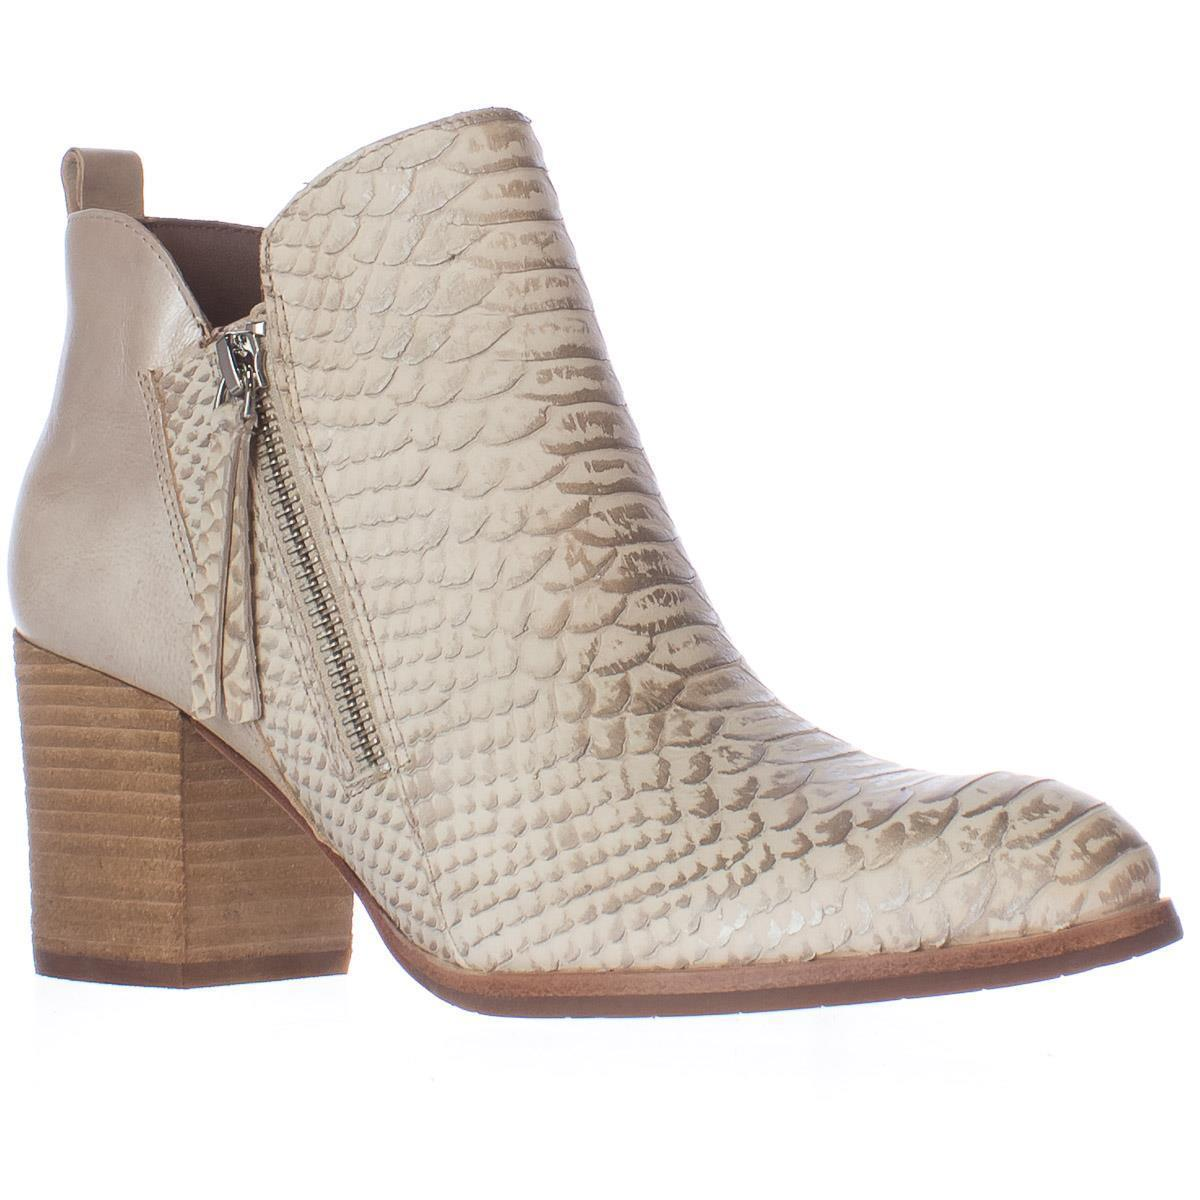 Womens Donald J Pliner Edyn Side Zip Ankle Boots, Ivory by Donald J Pliner